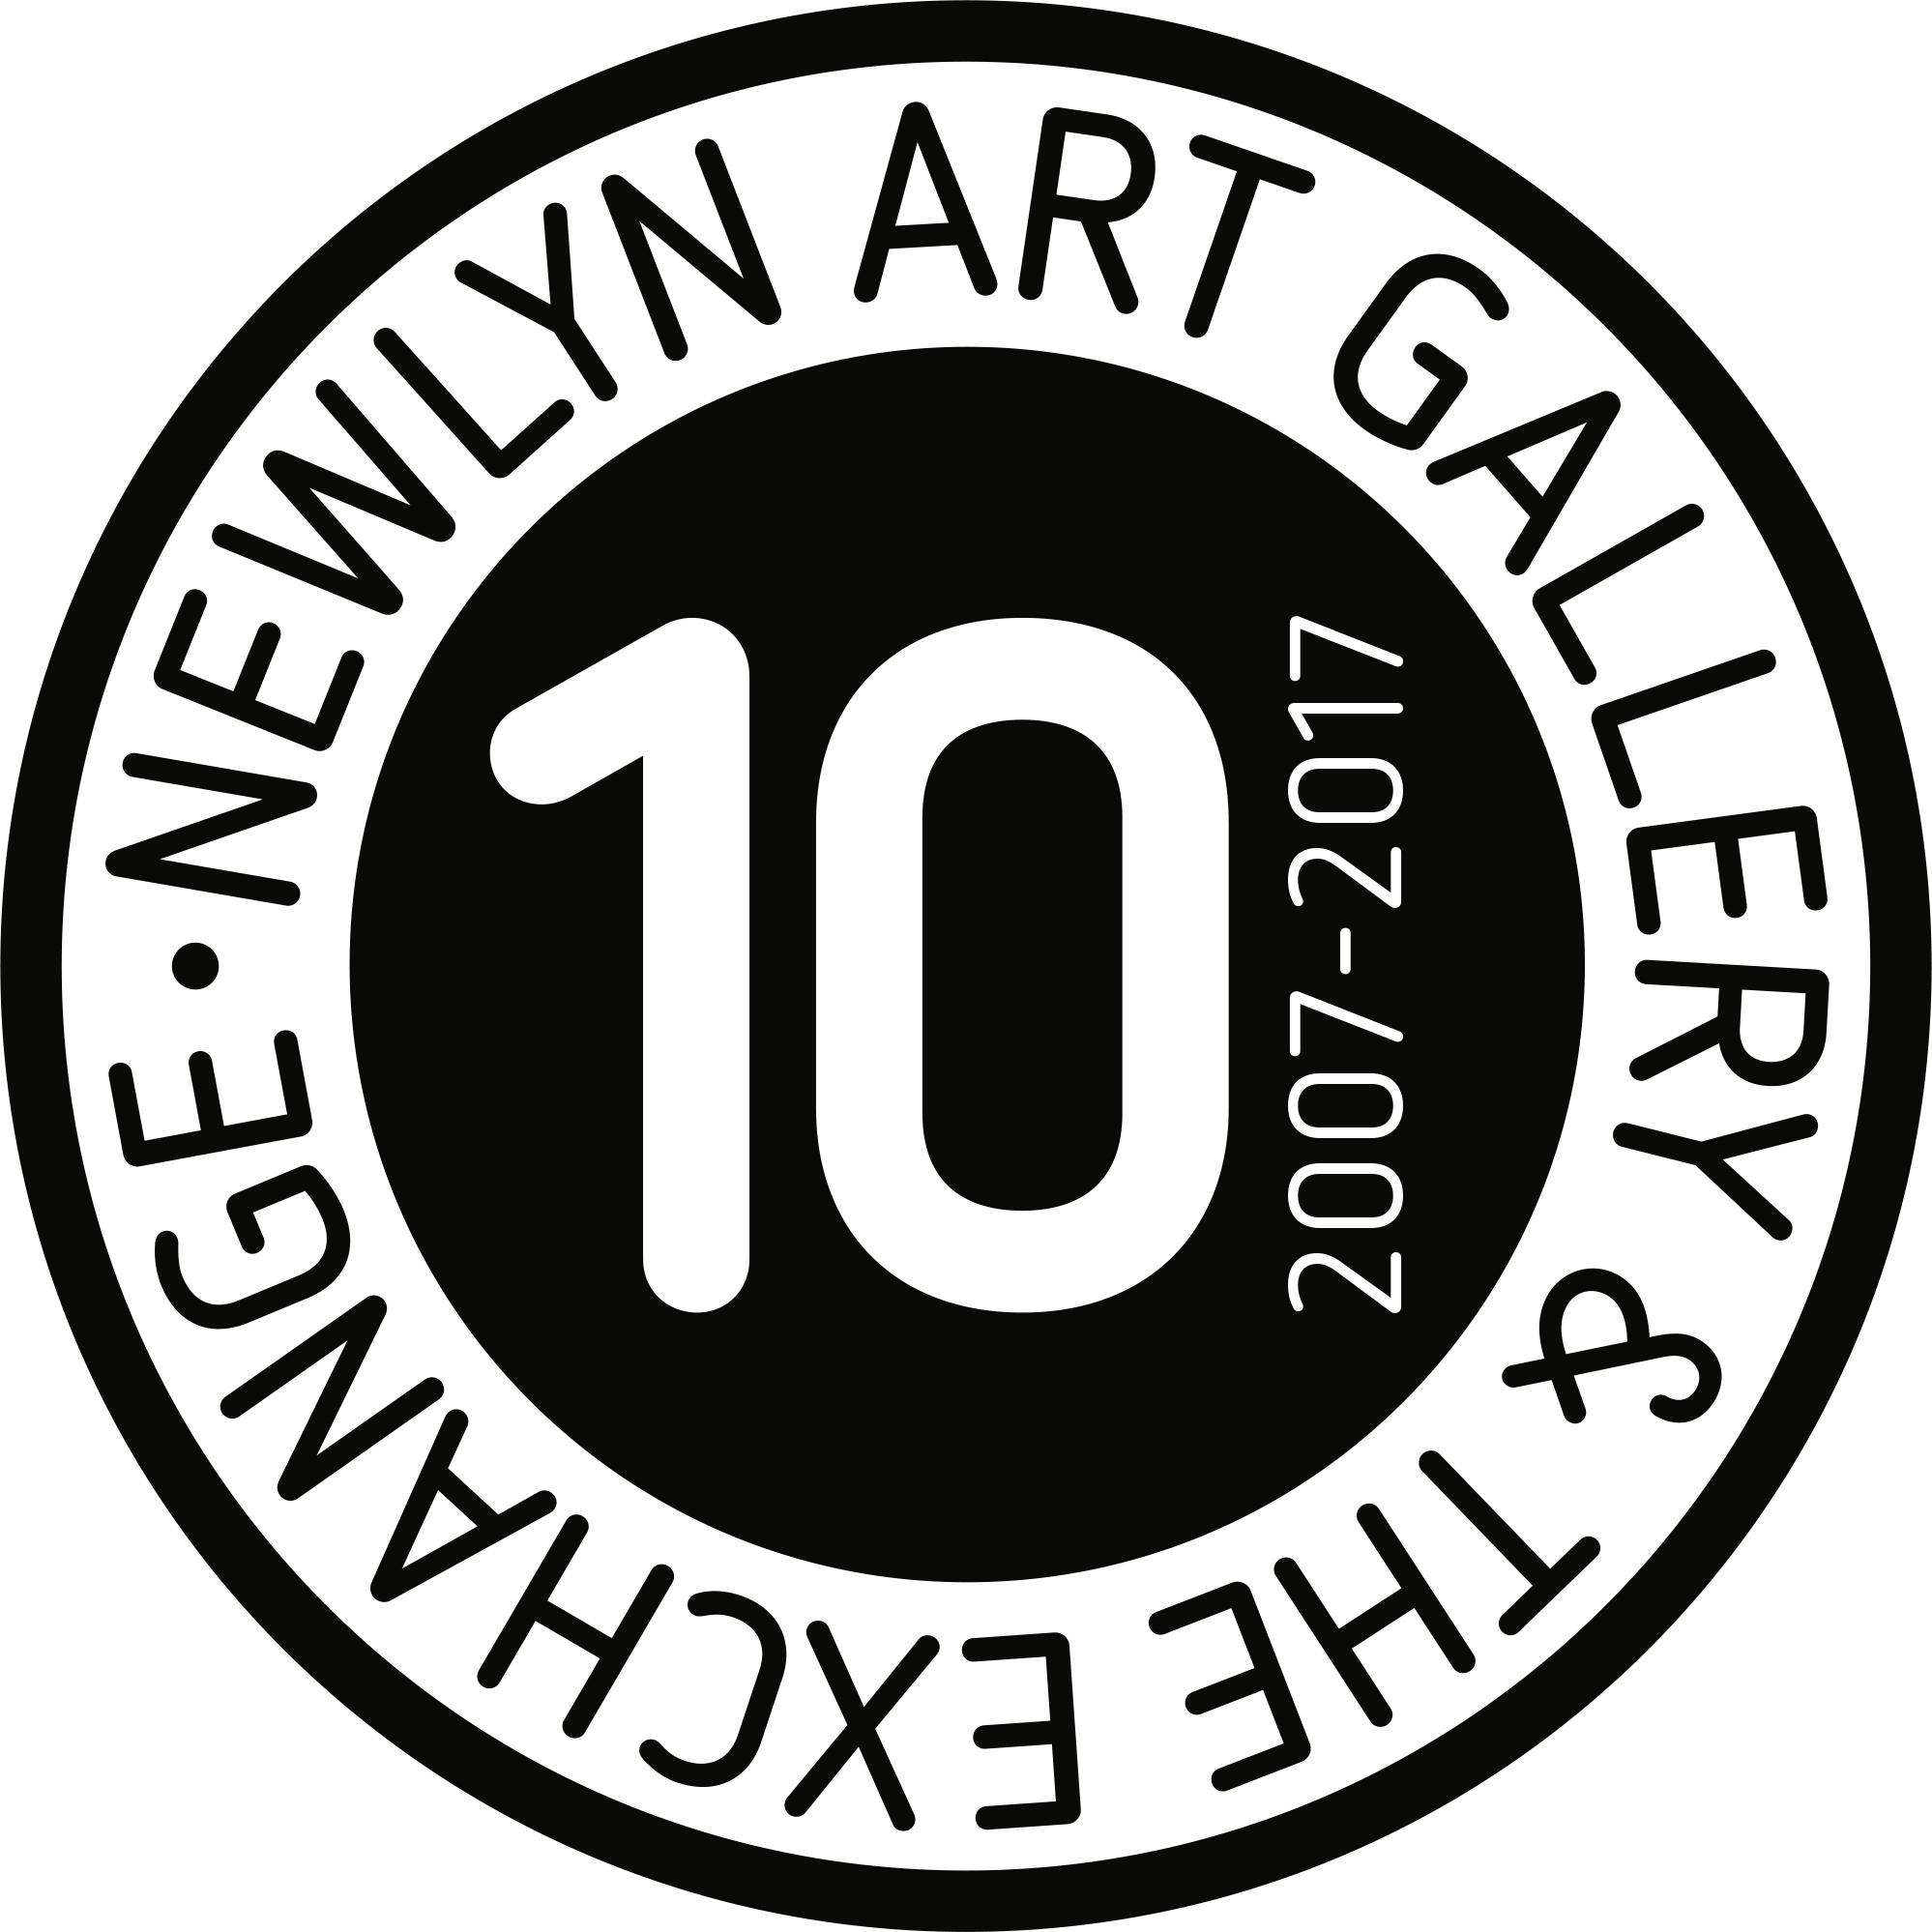 10th Anniversary Newlyn Art Gallery & The Exhange Logo